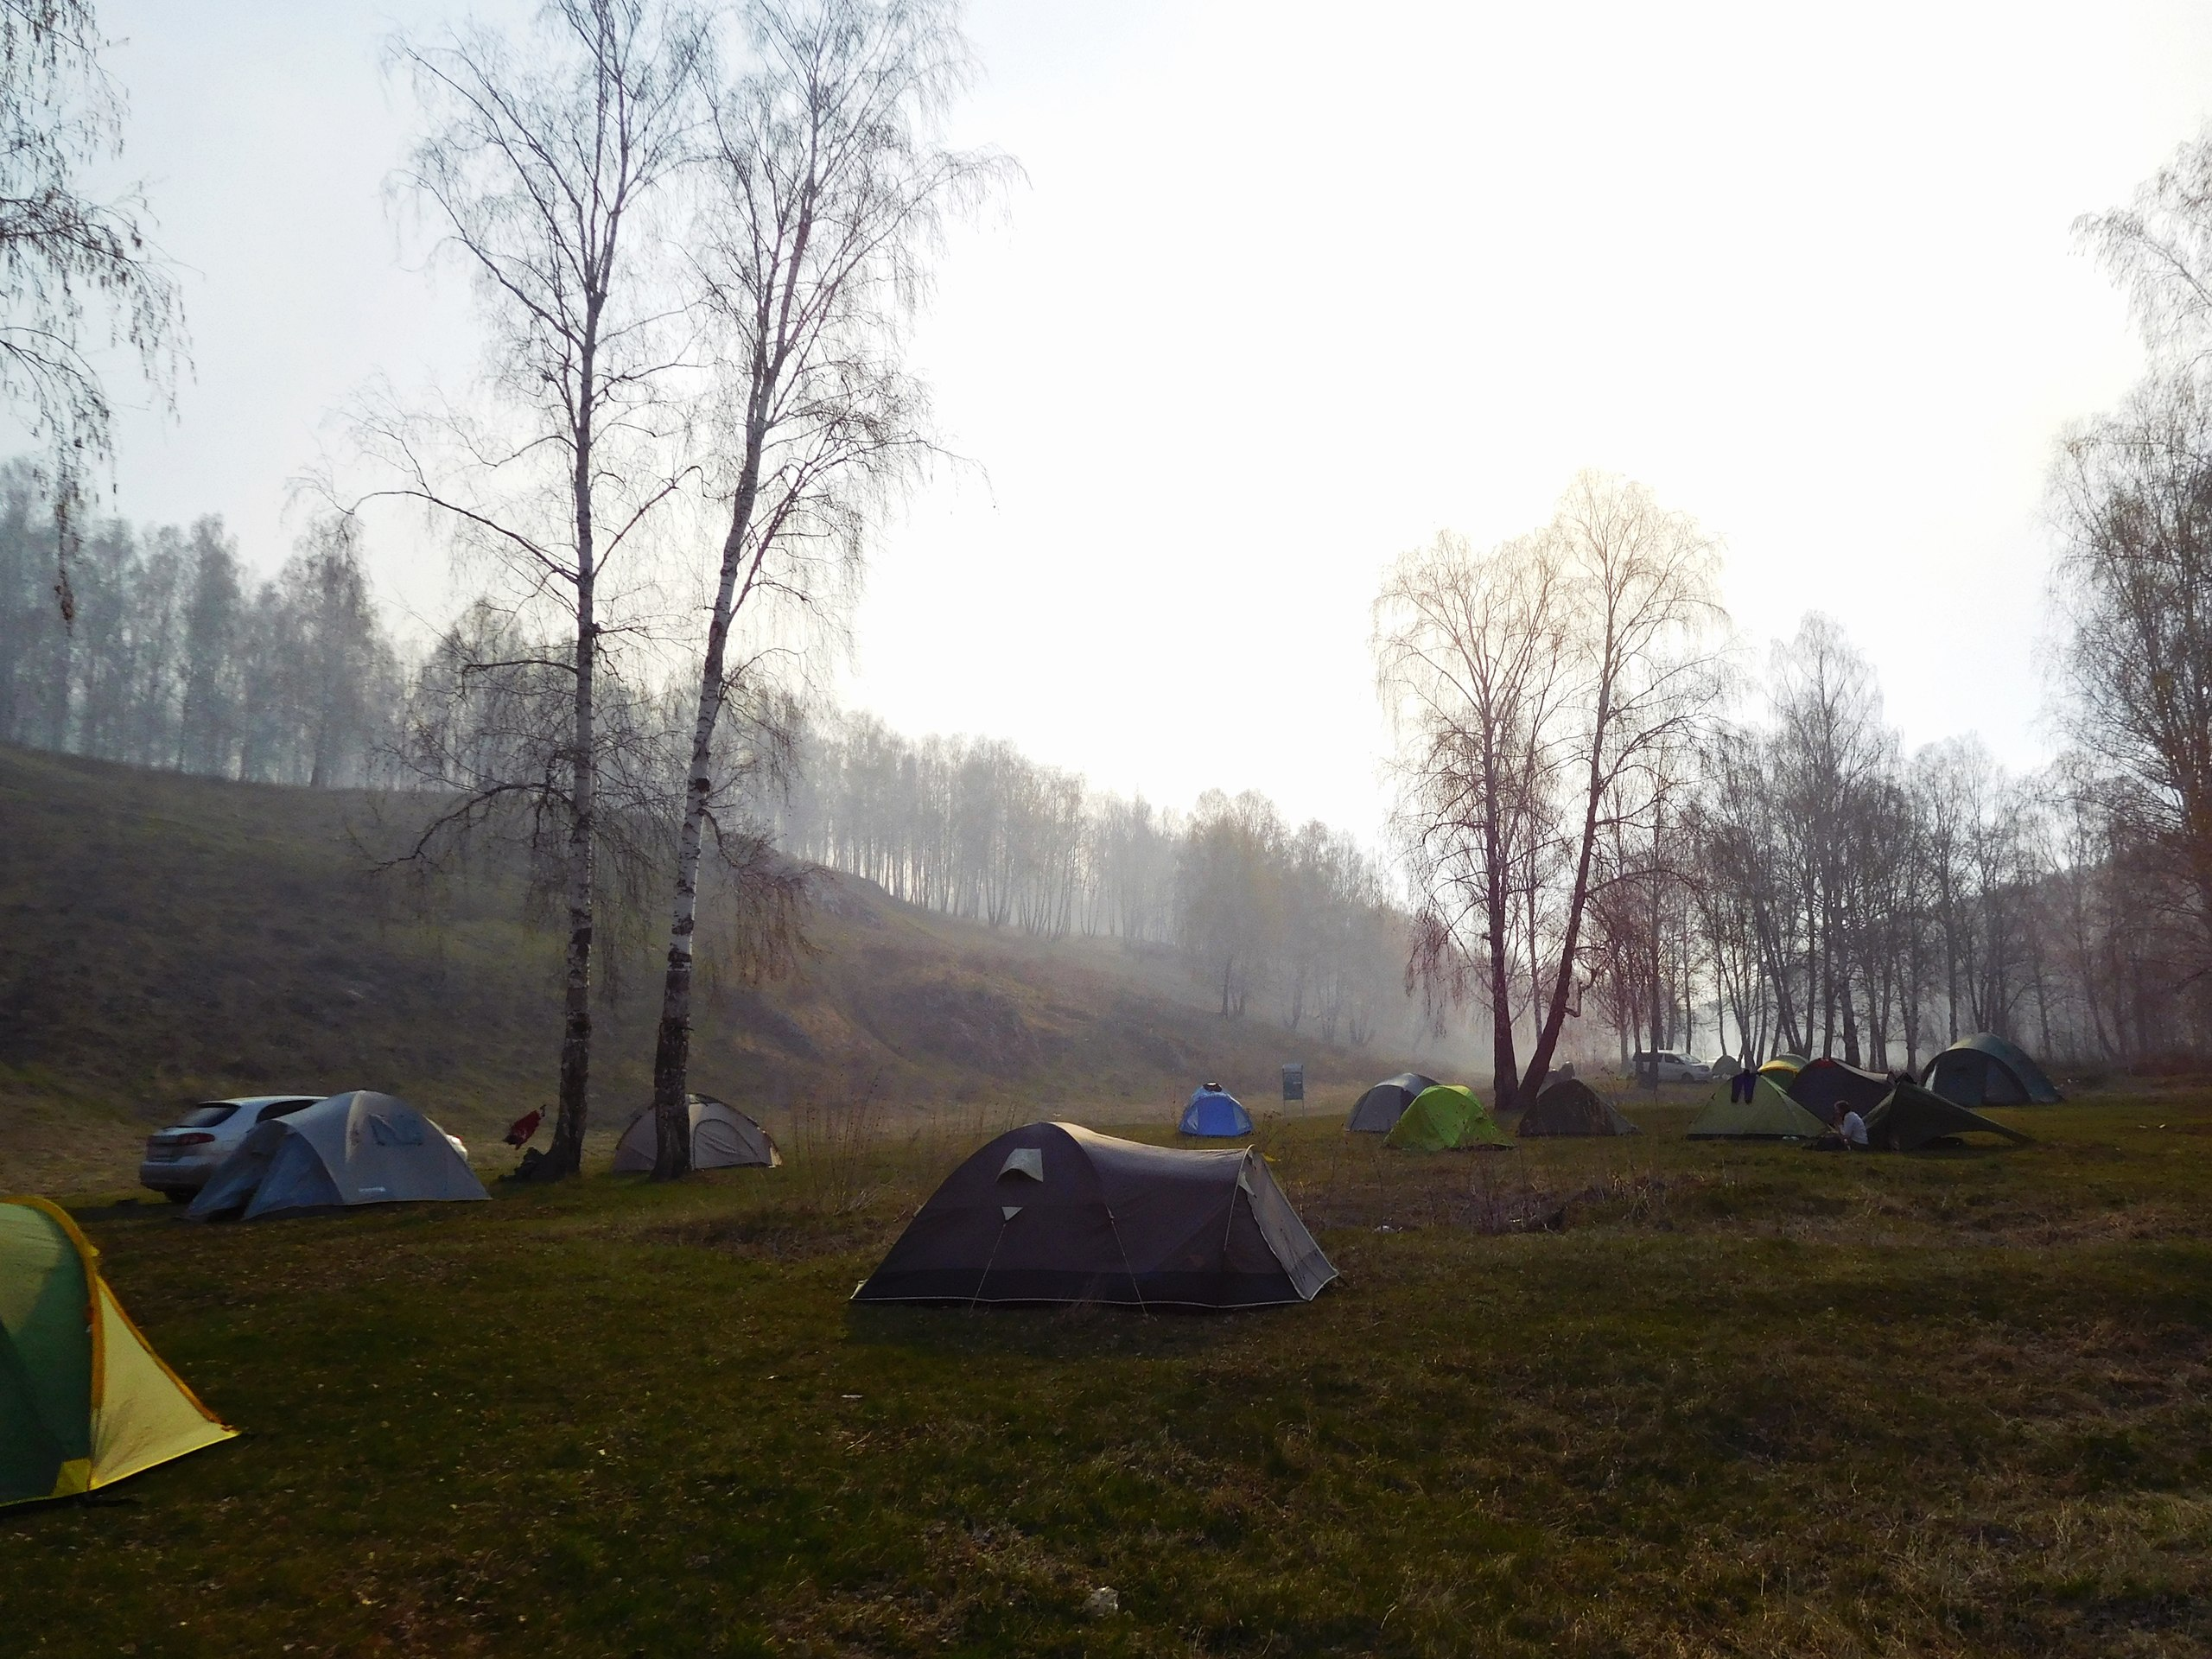 У порога —удобная площадка для палаток